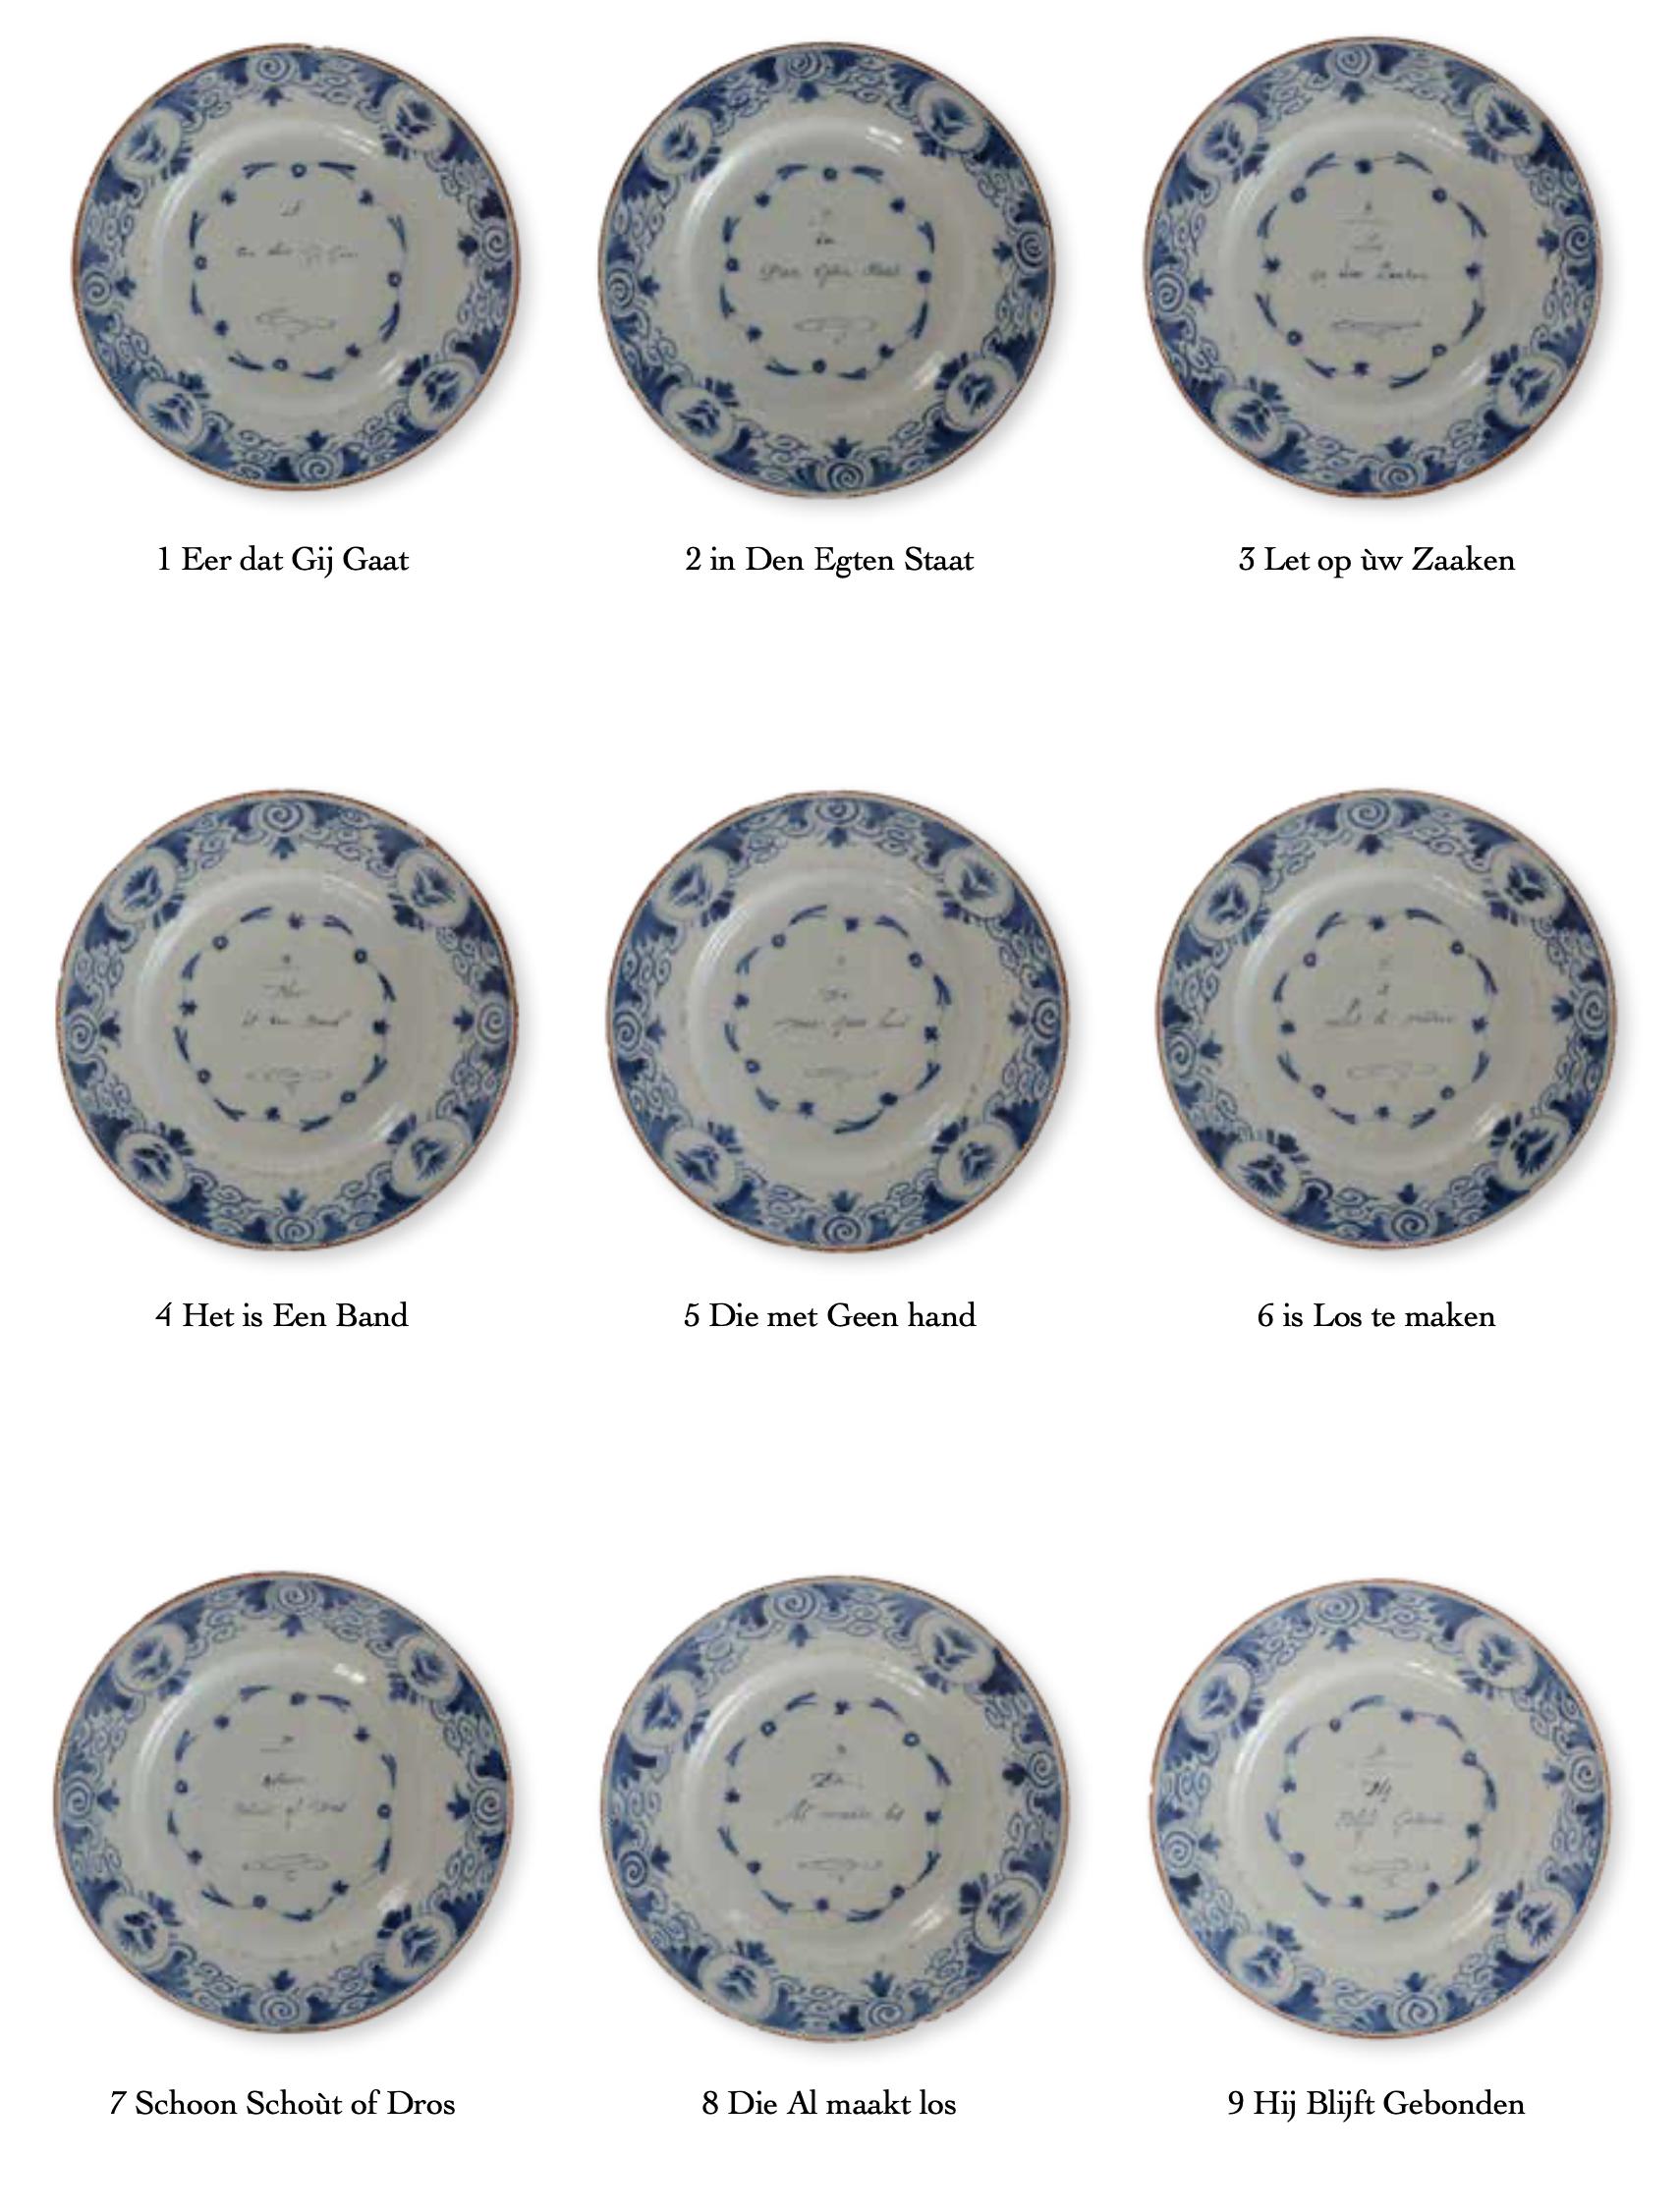 d2145. Nine Plates